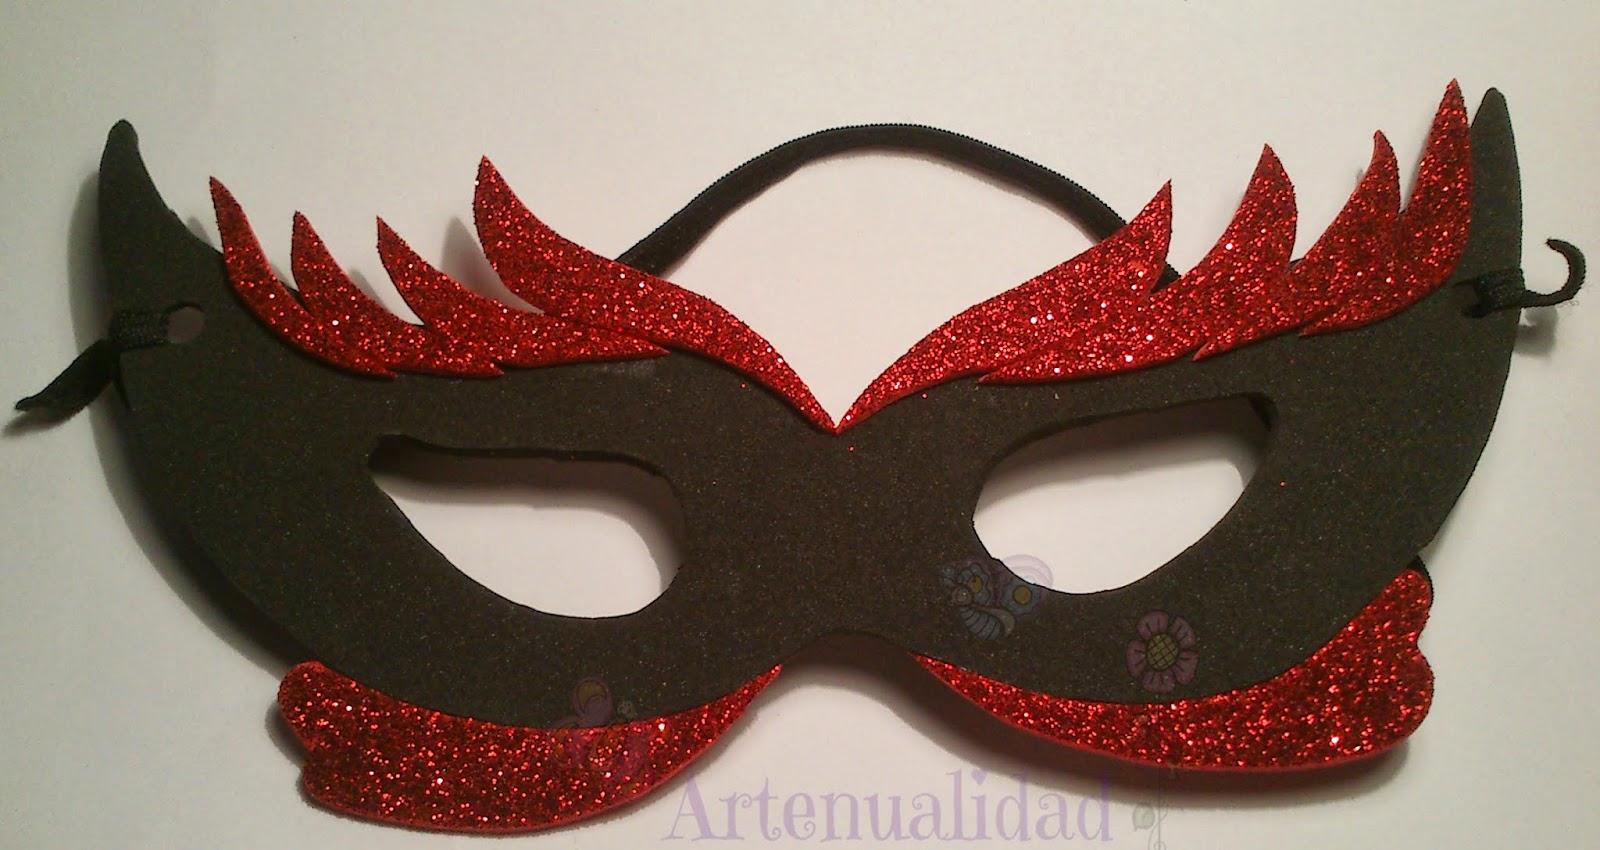 Mascaras para carnaval artenualidad - Mascaras para carnaval manualidades ...